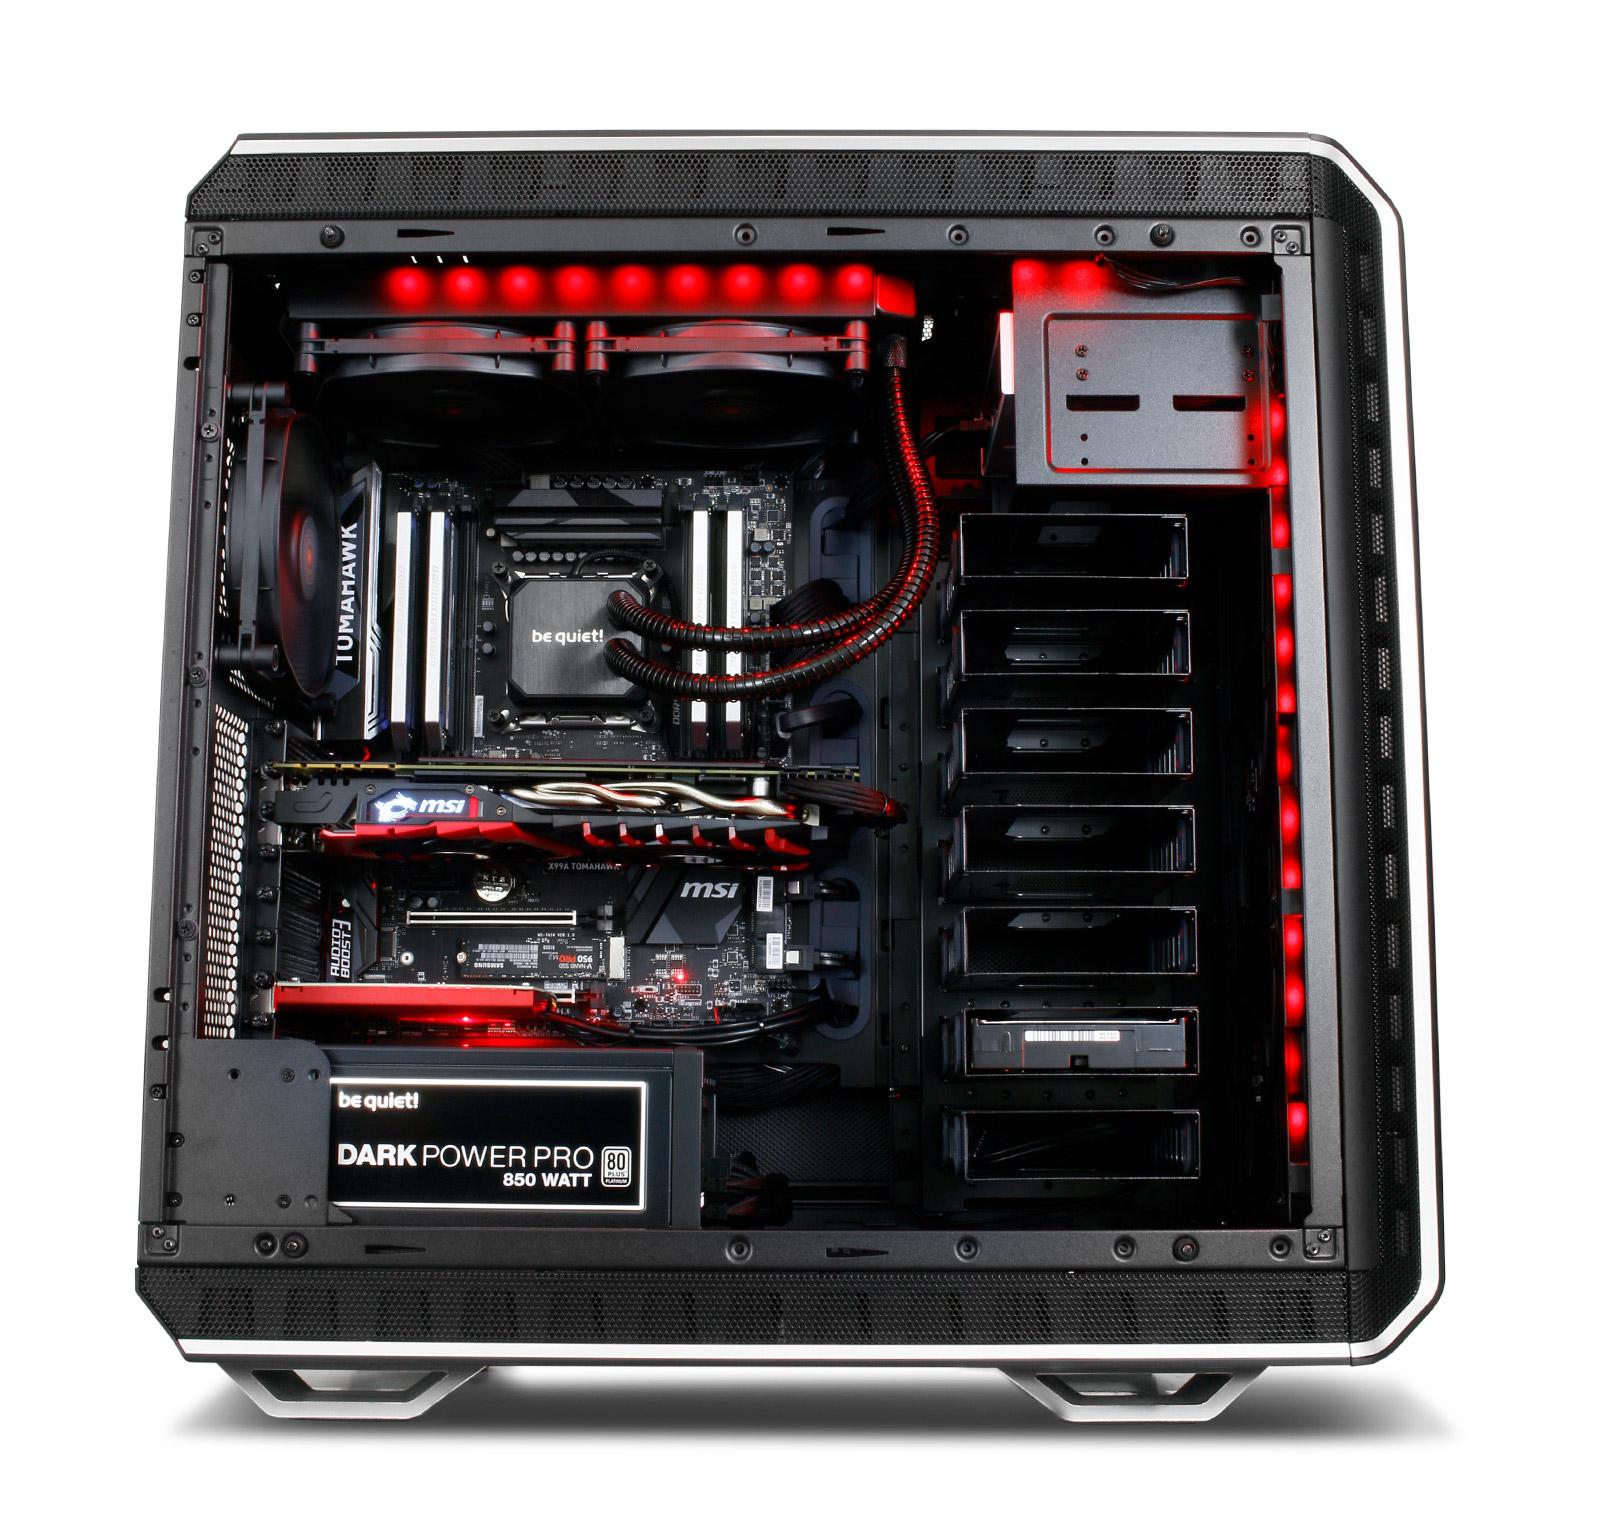 Silent-PC Core i7-7700K - GTX 1080 Ti SSD be quiet ...